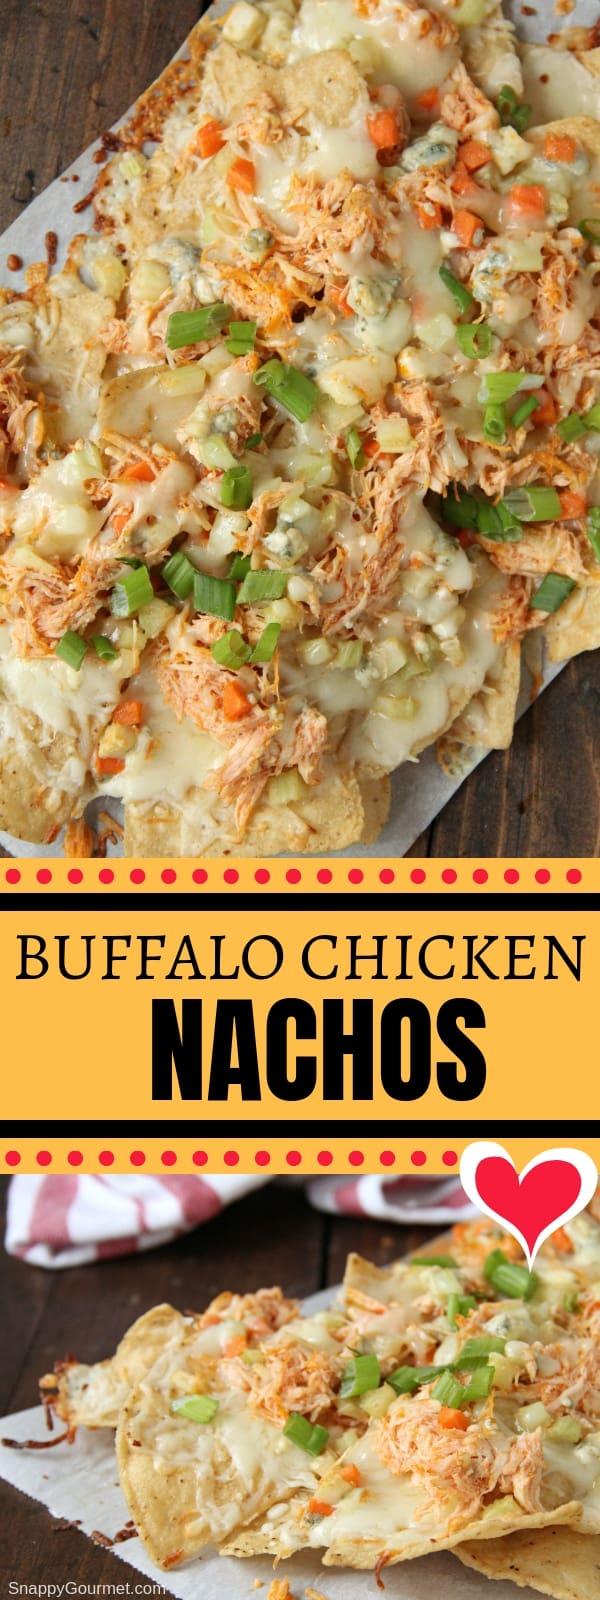 Buffalo Chicken Nachos collage